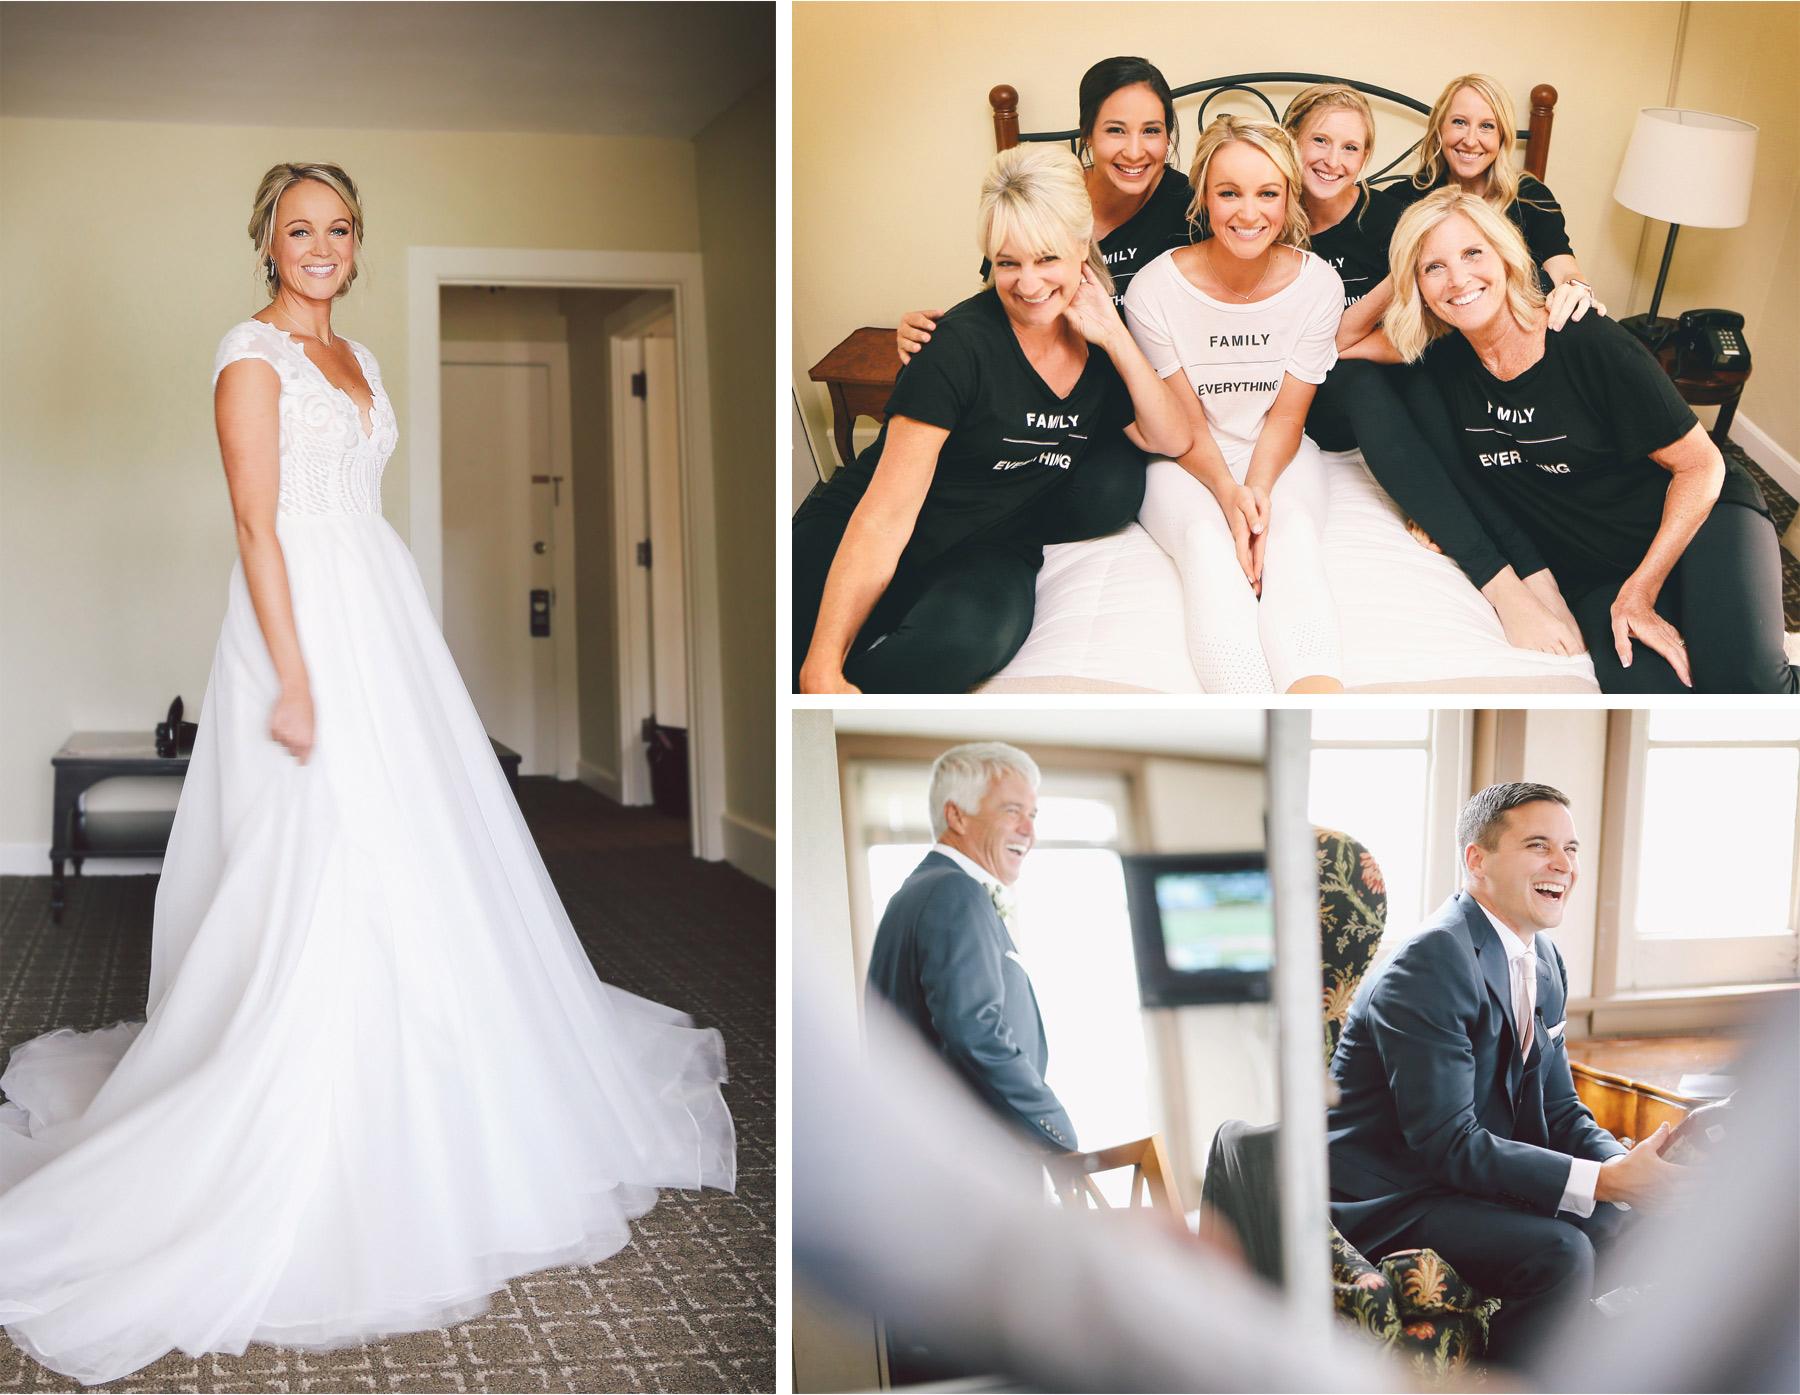 02-Minnetonka-Minnesota-Wedding-Photography-by-Vick-Photography-Wedding-Dress-Morning-Getting-Ready-Jennifer-and-Adam.jpg